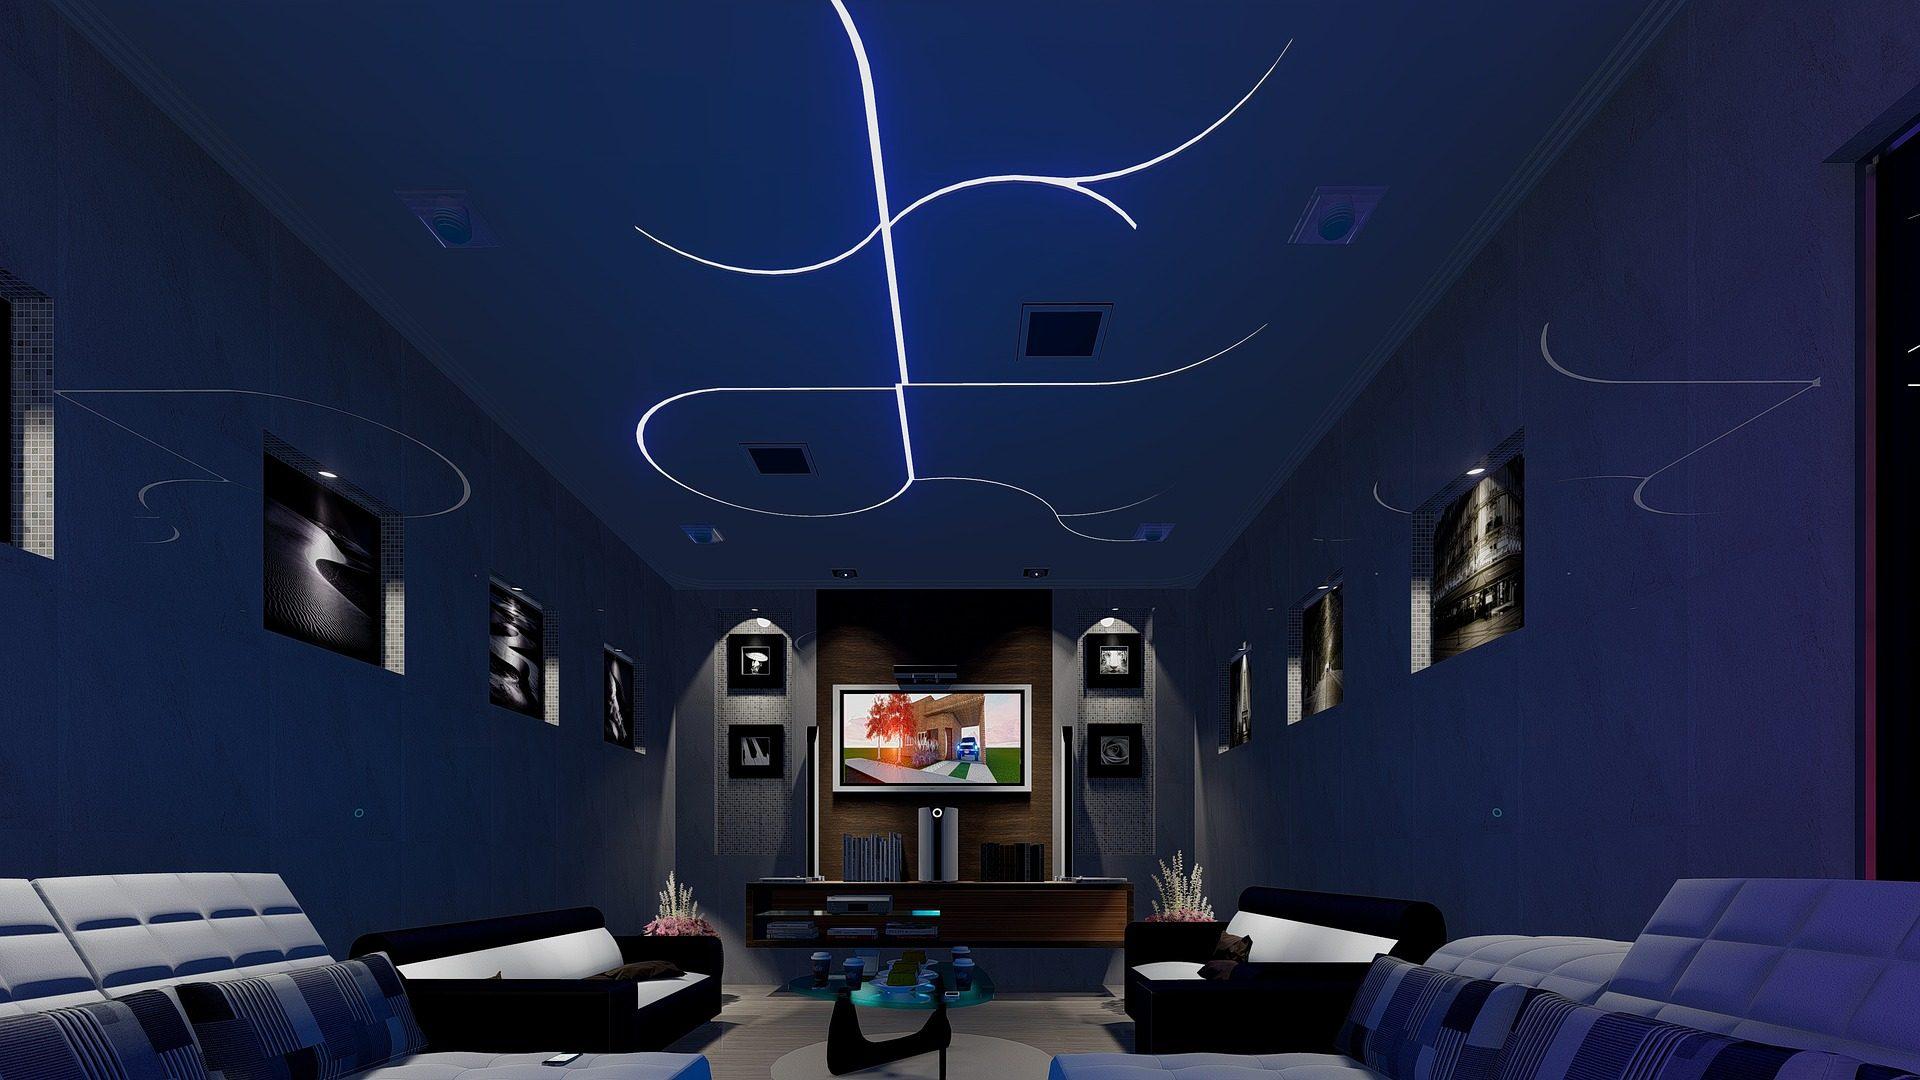 habitación, 部屋, リビング ルーム, 宿泊, モダンです, 未来的です - HD の壁紙 - 教授-falken.com